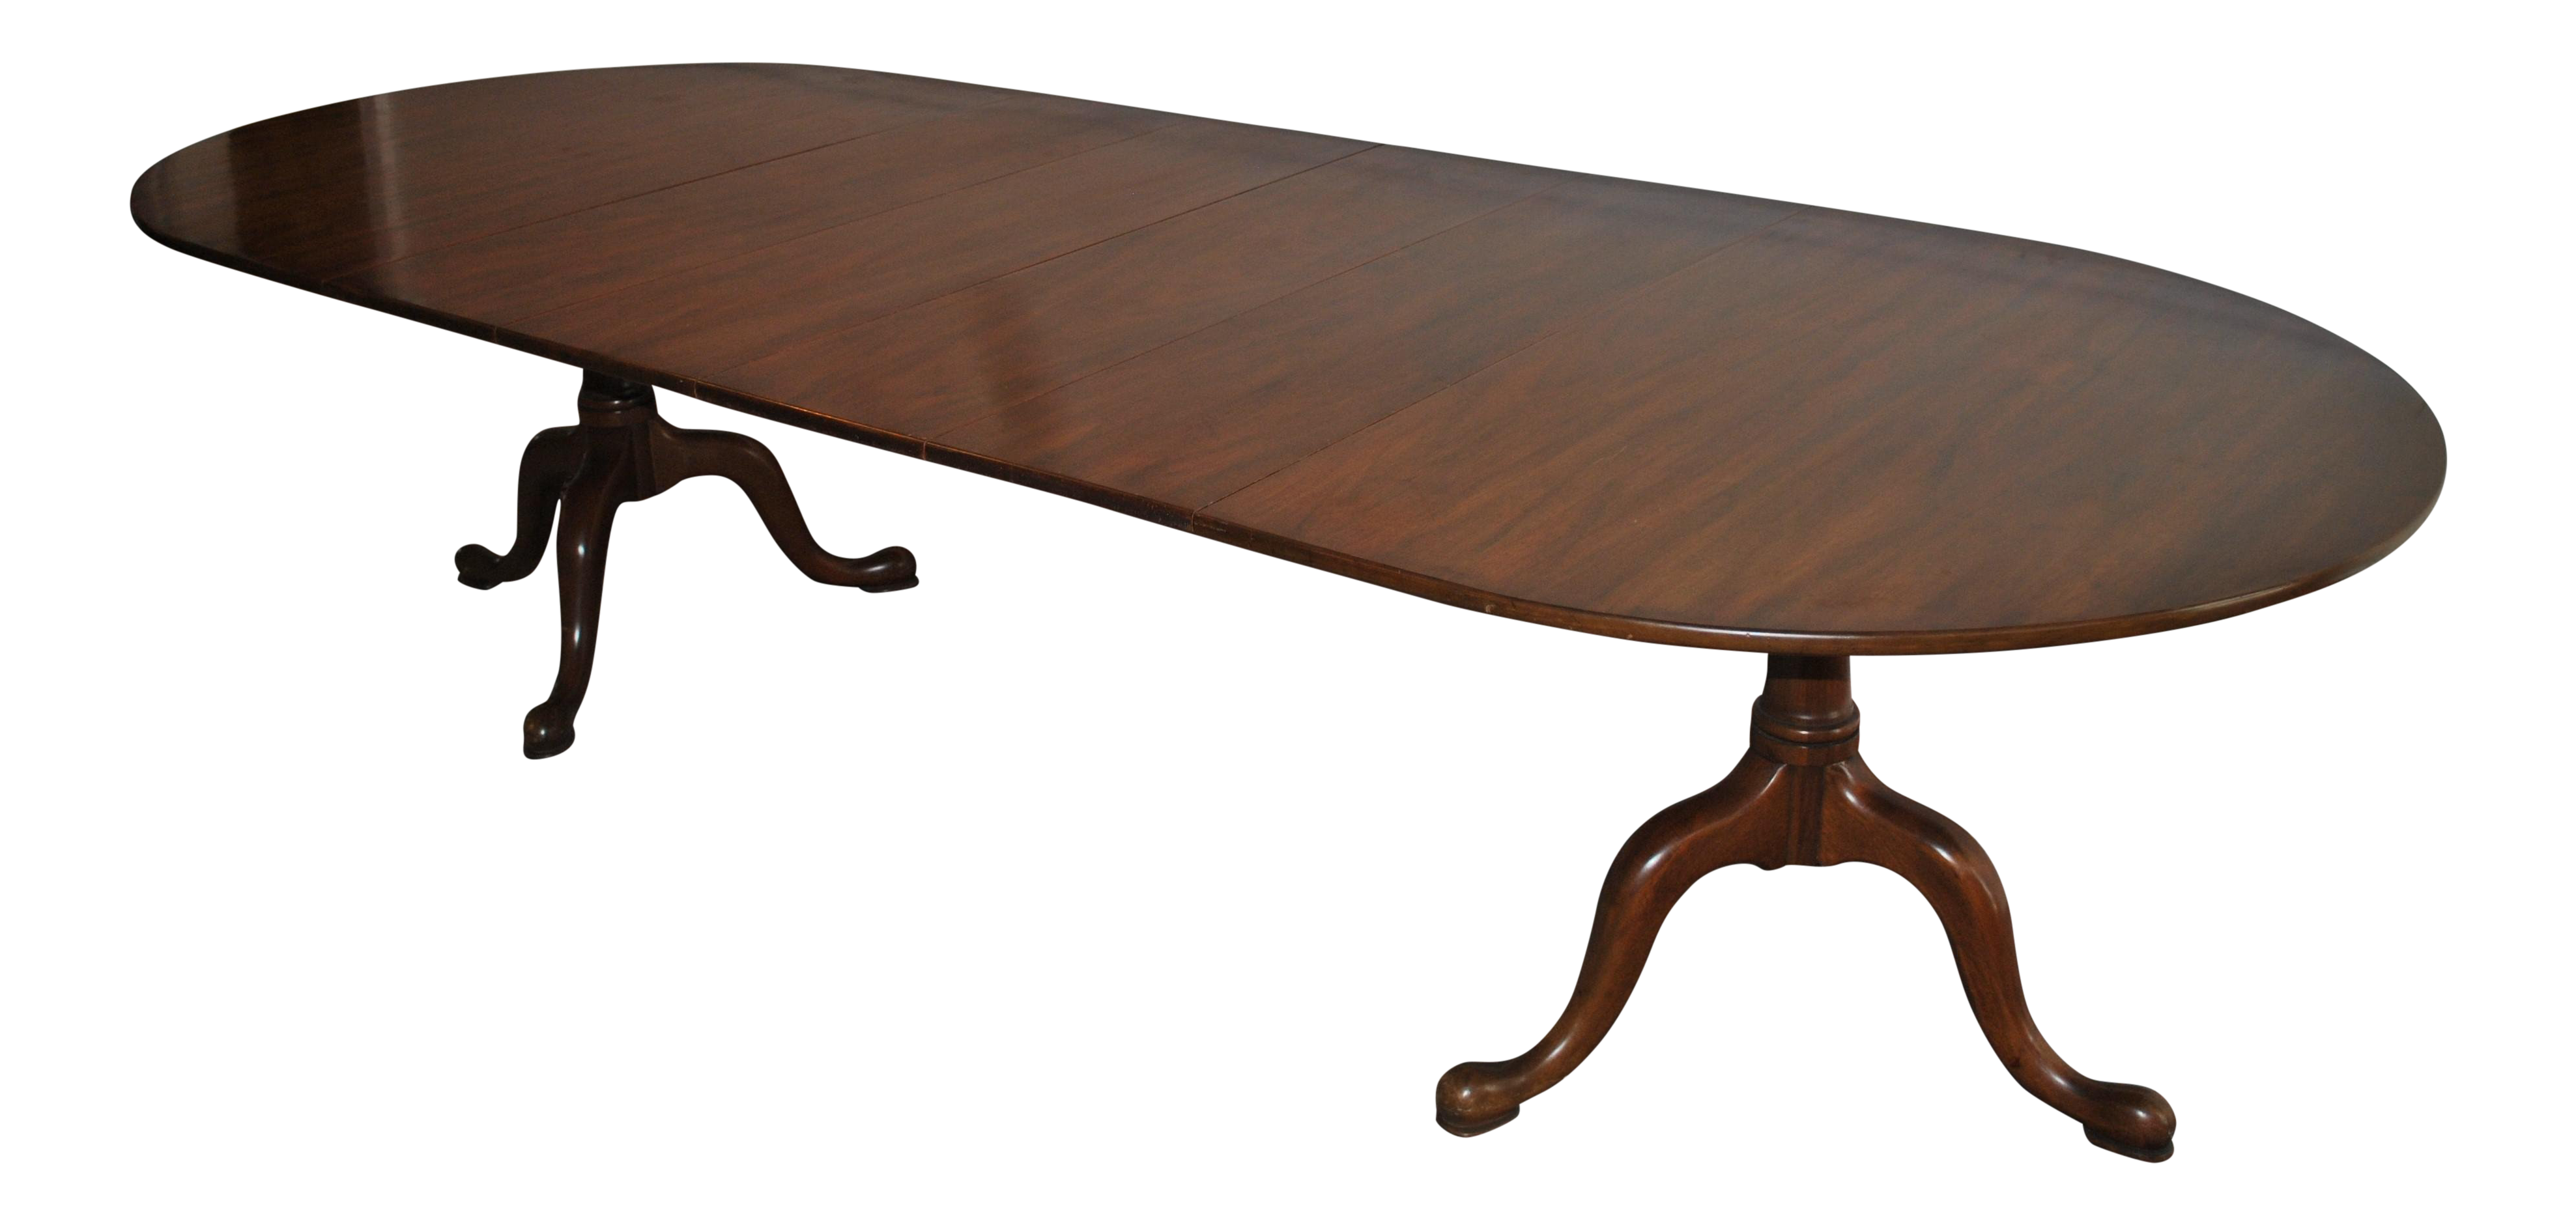 20th Century Queen Anne Henkel Harris Mahogany Dining Table